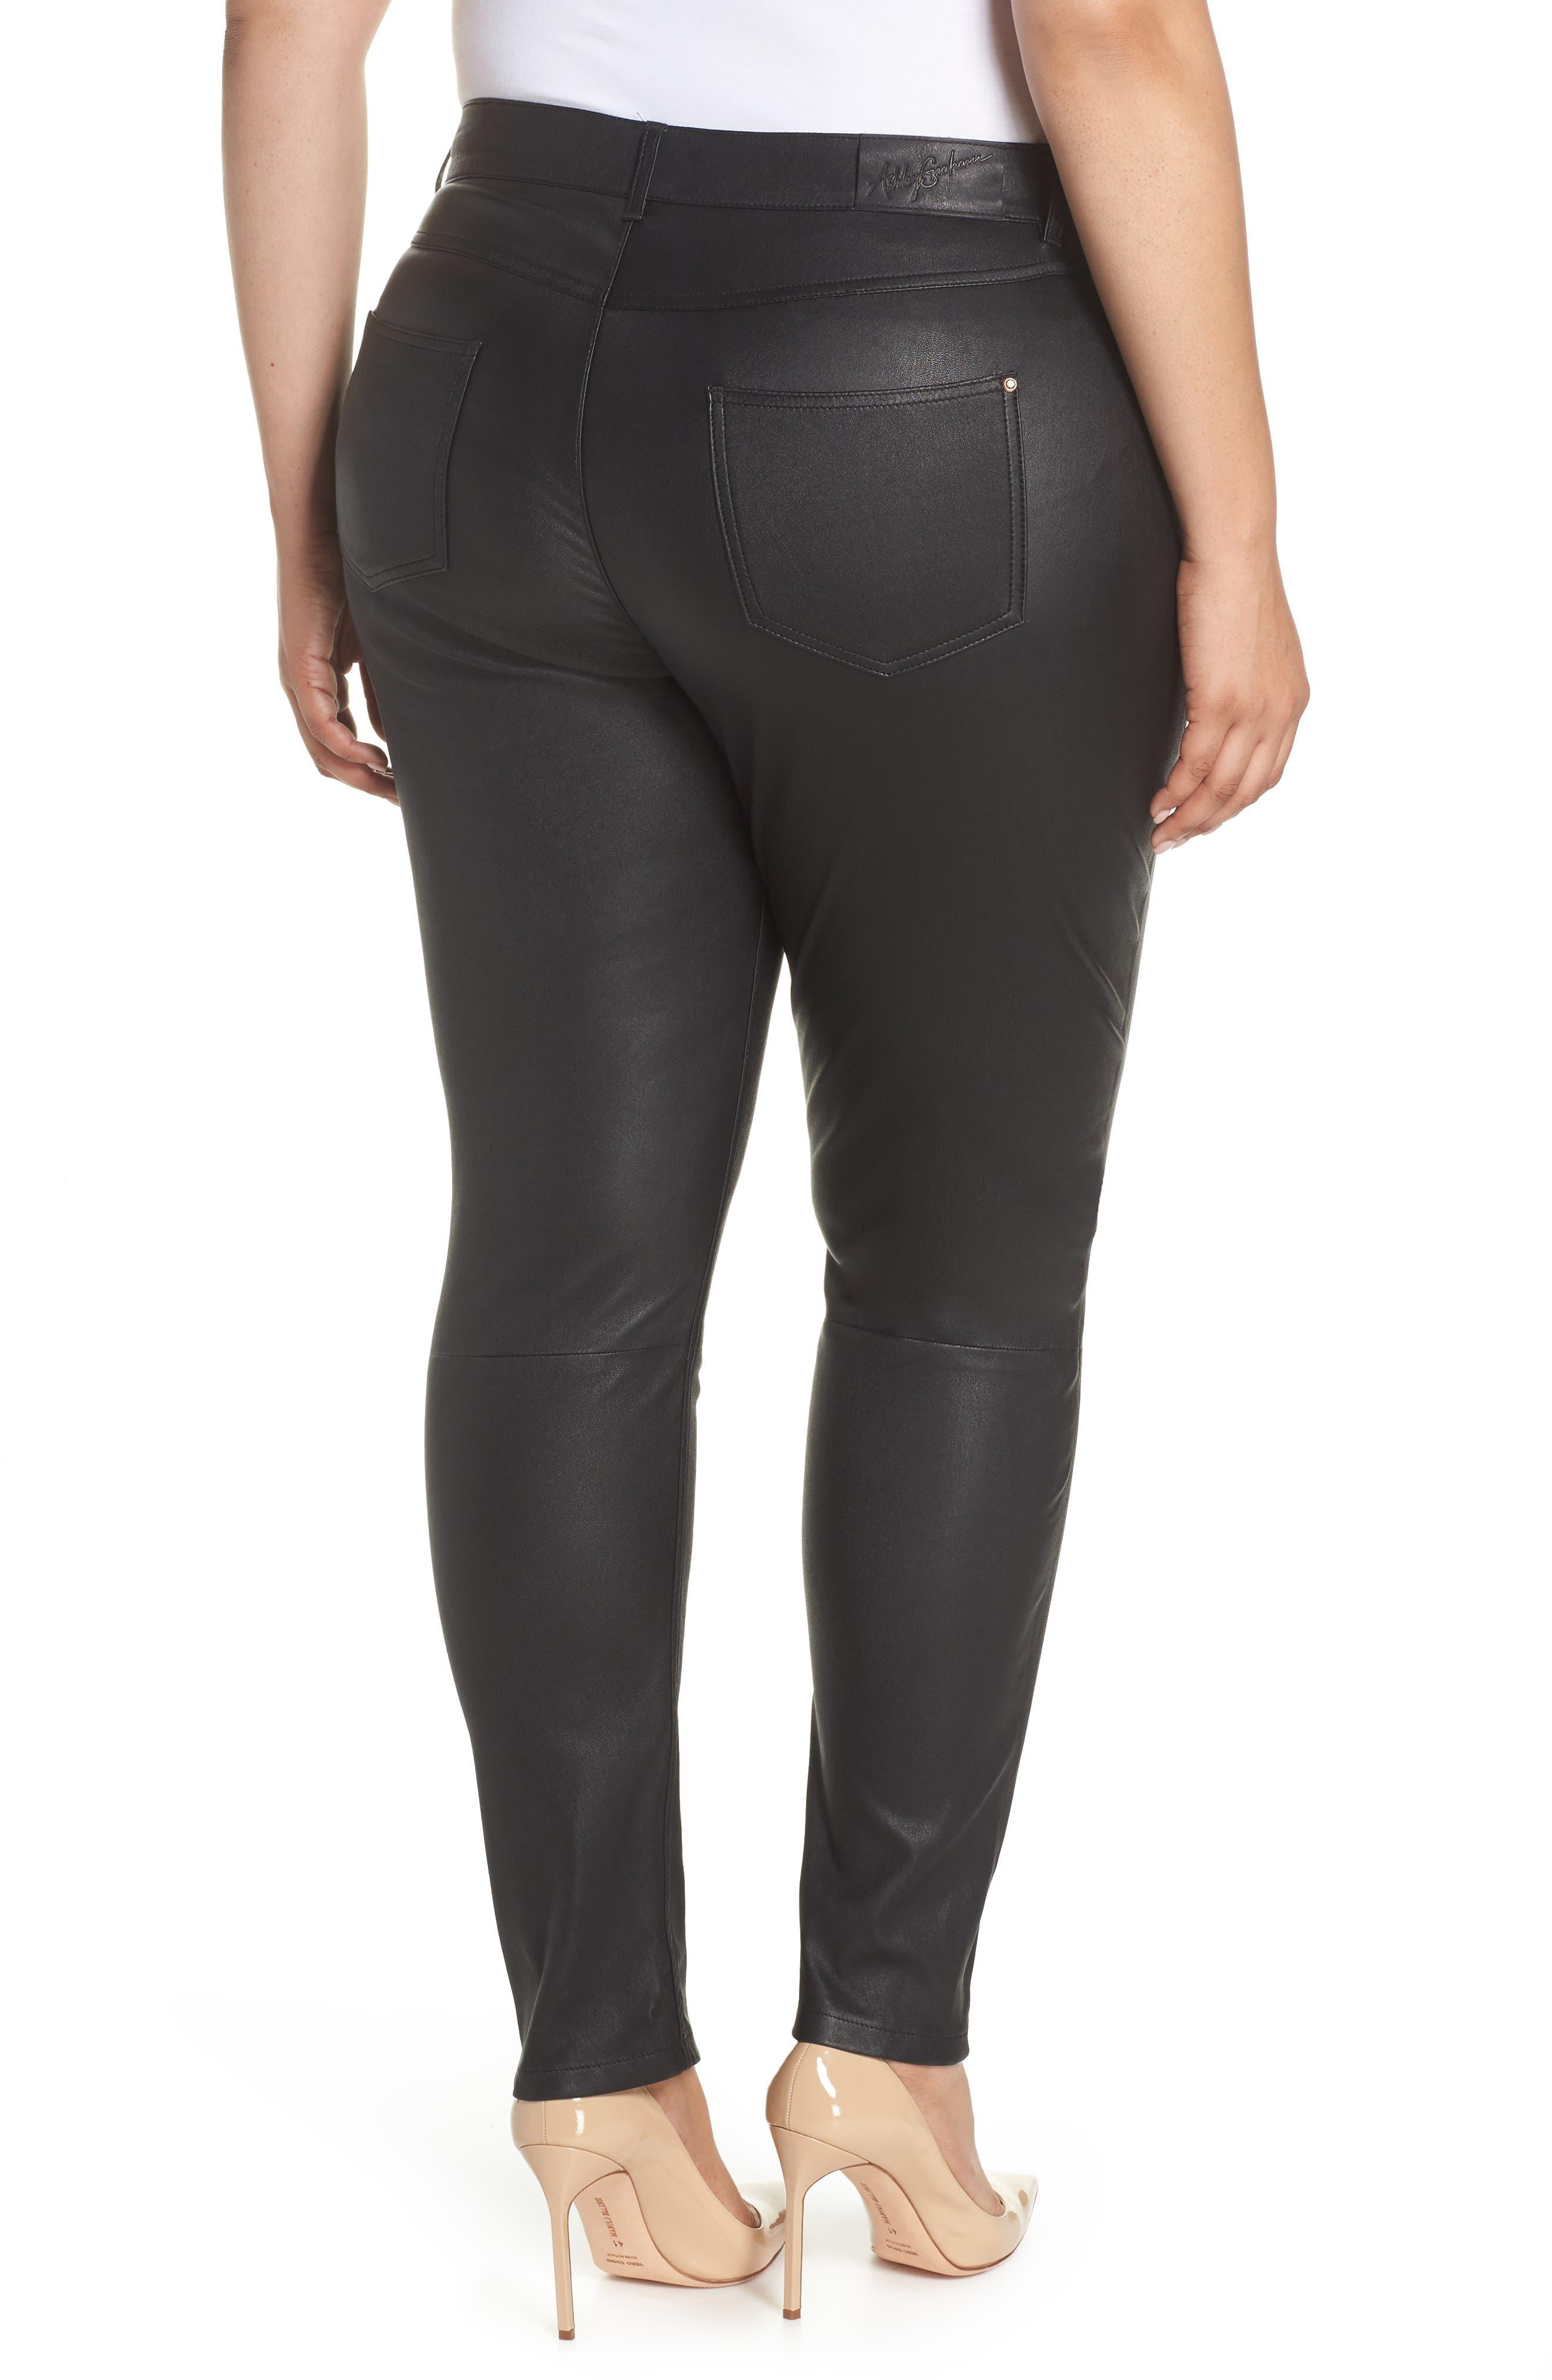 Eboli Leather Pants,                             Alternate thumbnail 2, color,                             001